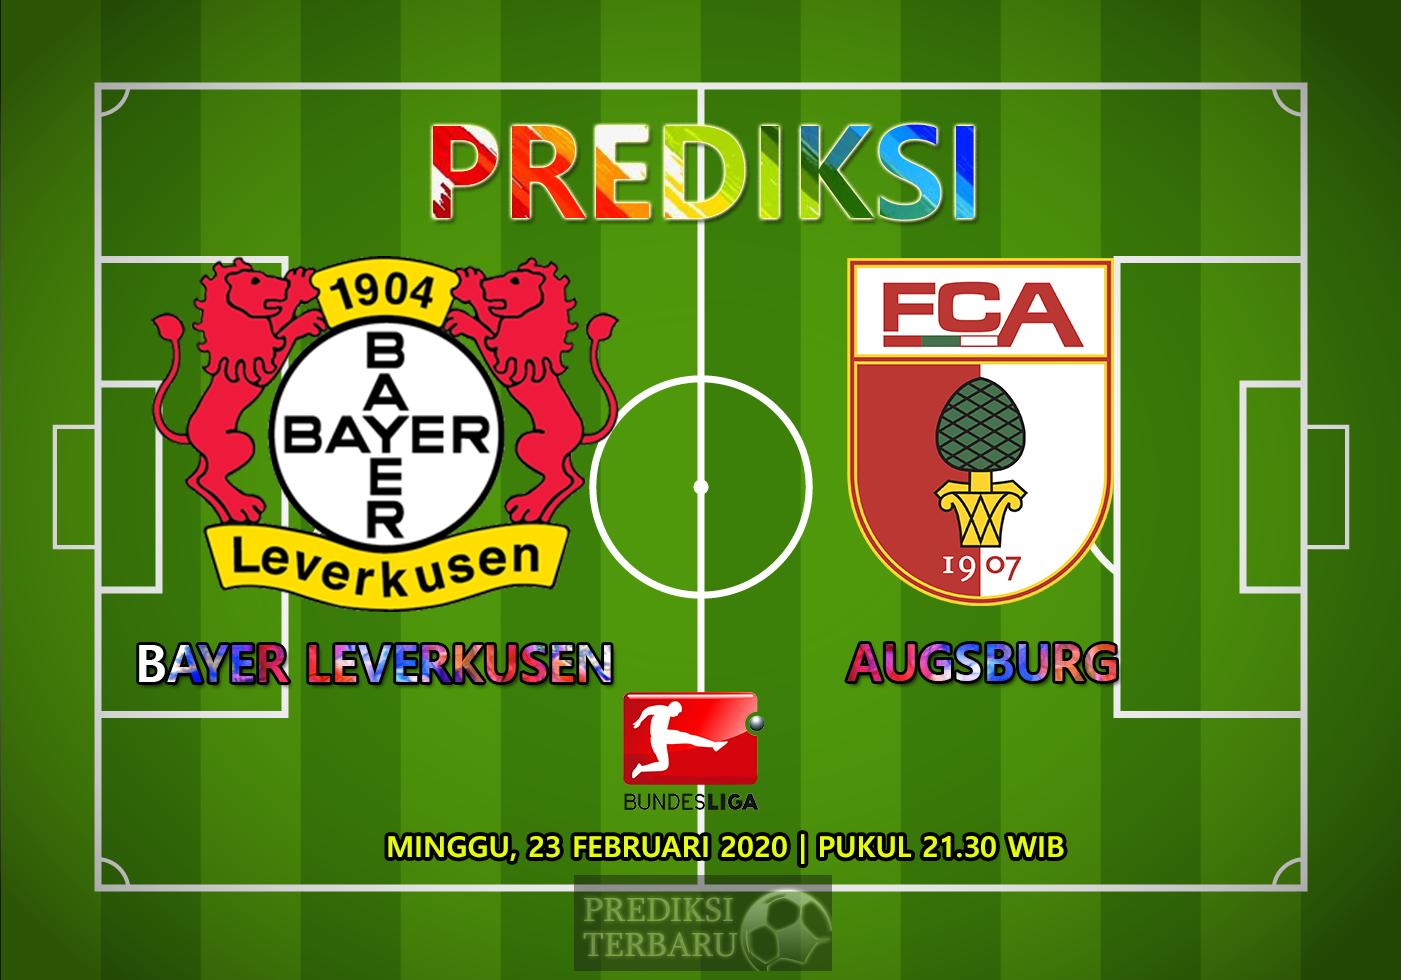 Prediksi Bayer Leverkusen Vs Augsburg, Minggu 23 Februari